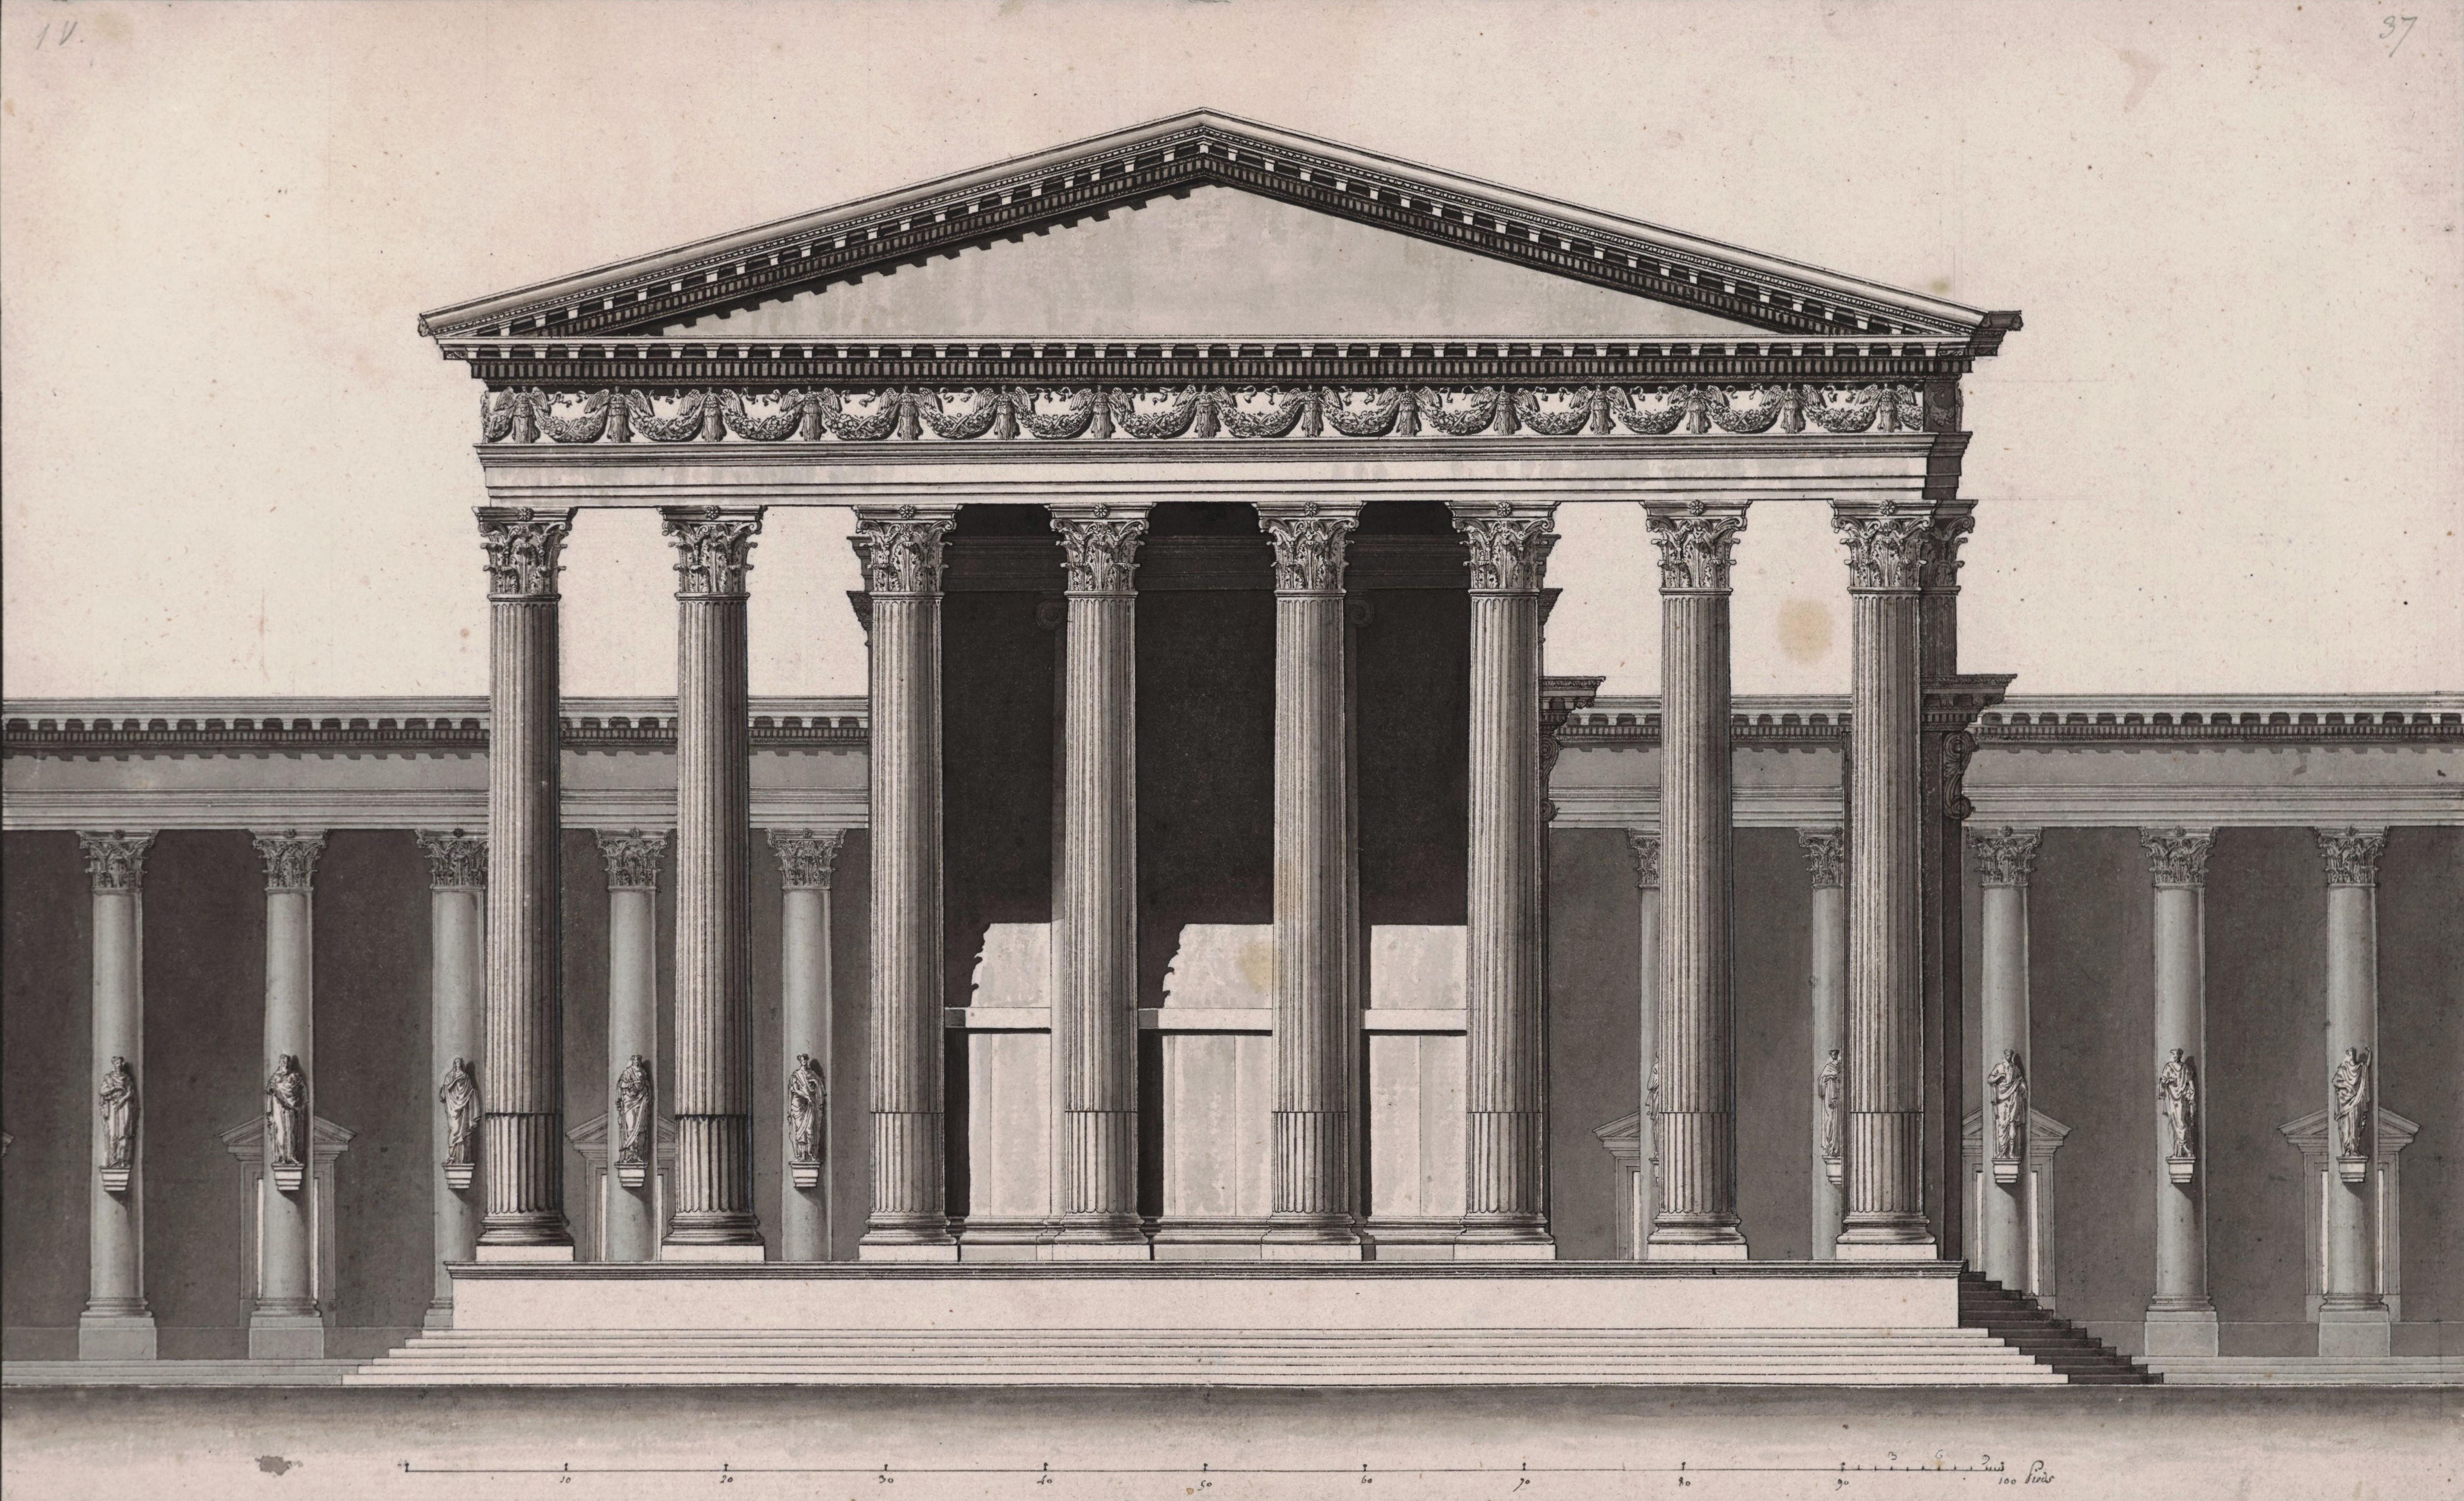 Louis François Cassas, Beltempel (Sonnentempel) von Norden, 1785, Feder in Schwarz, laviert, Wallraf-Richartz-Museum & Fondation Corboud, Köln